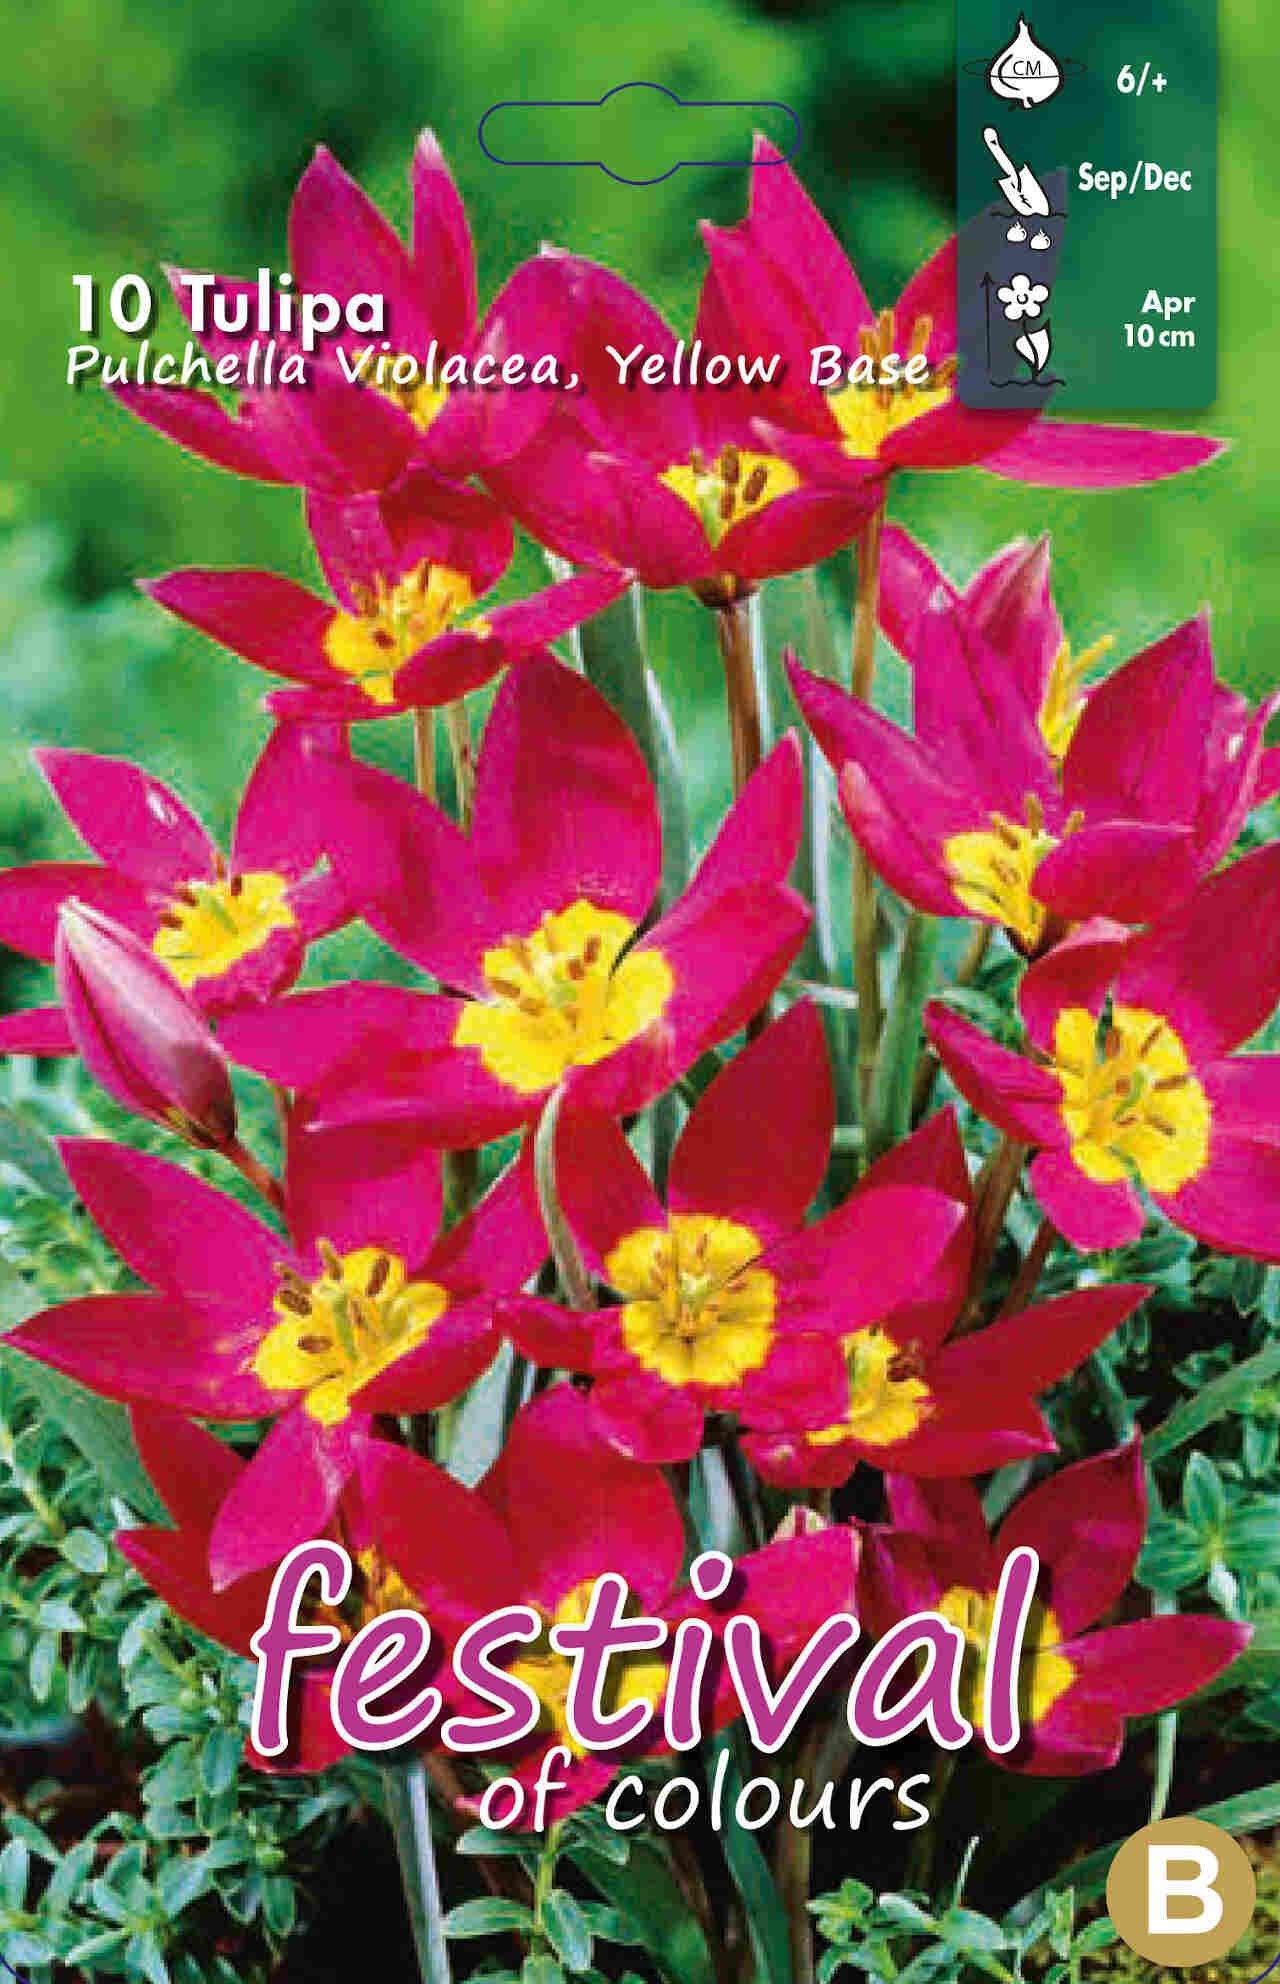 Tulipanløg - Tulipa Pulchella Violet Yellow Base 6/+